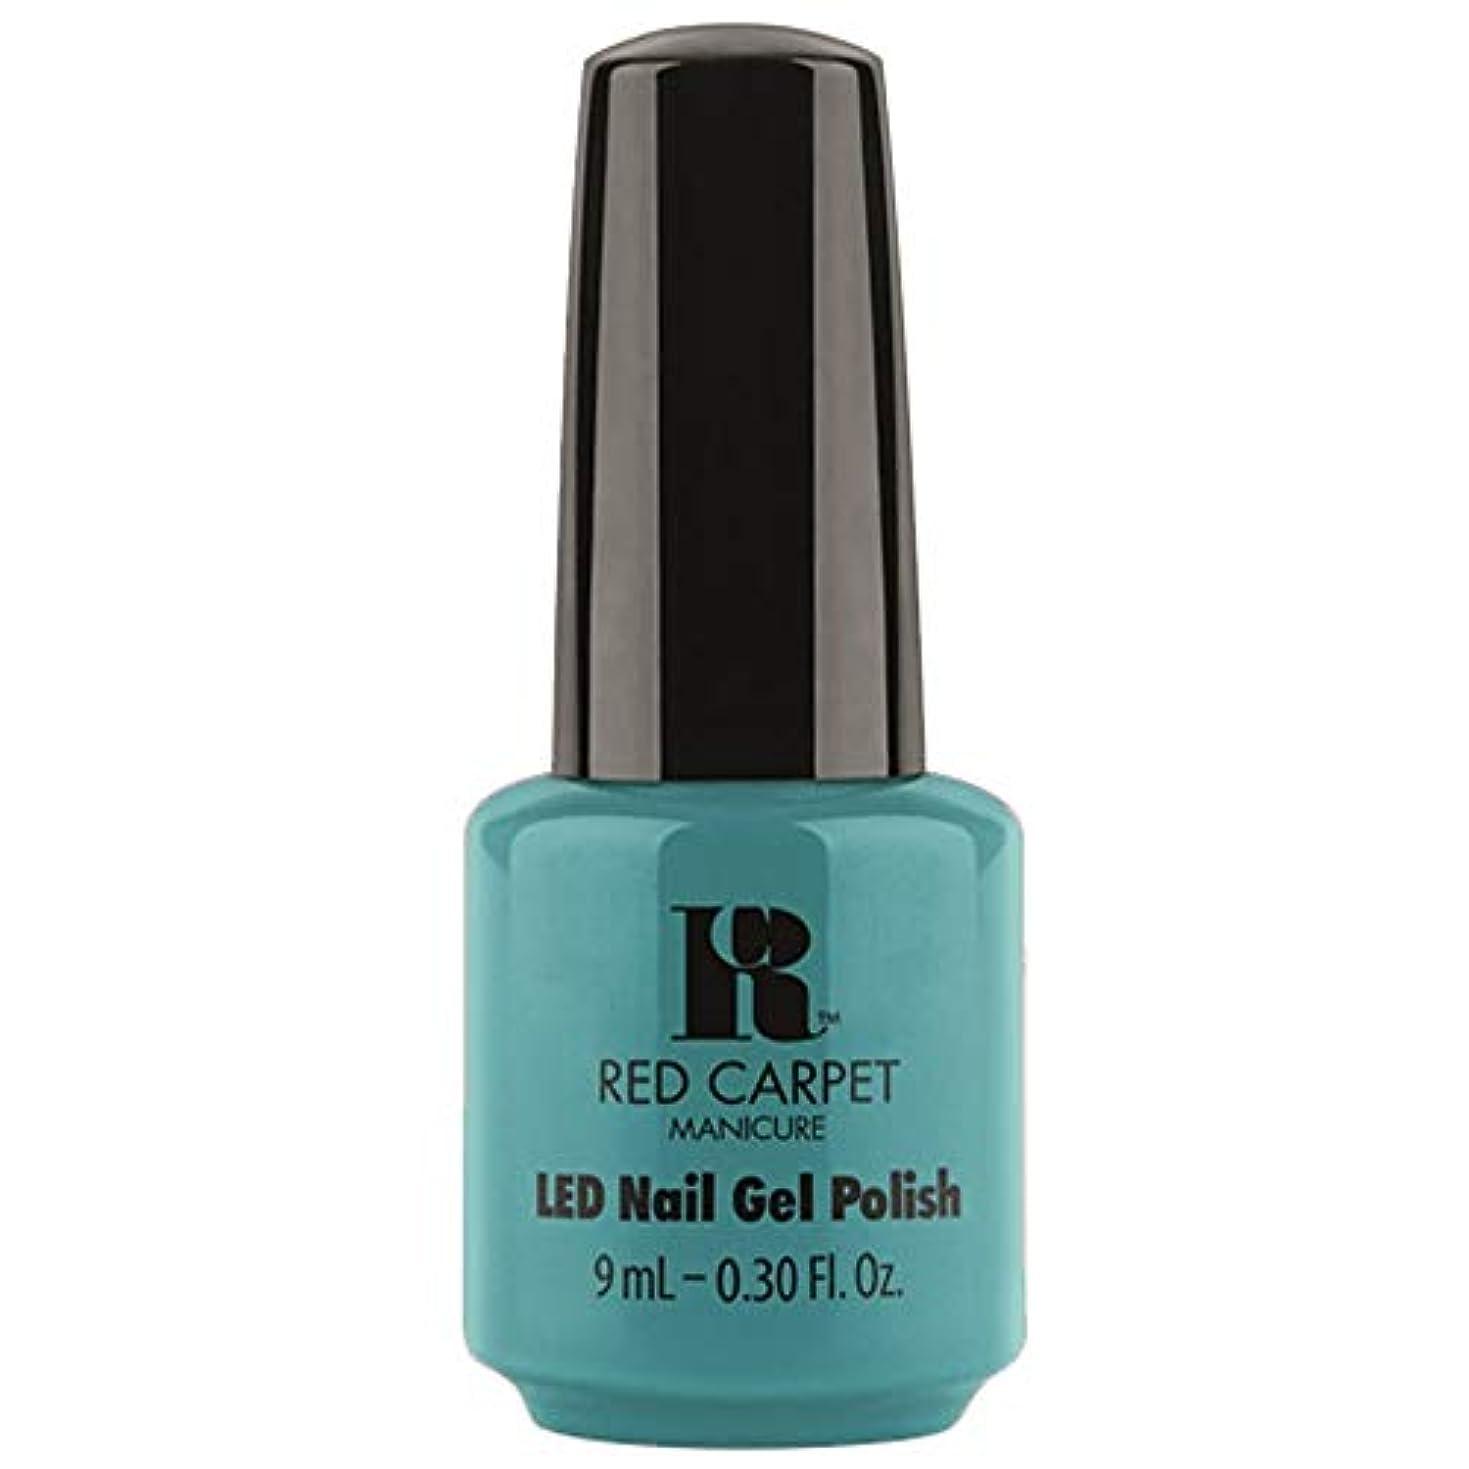 Red Carpet Manicure - LED Nail Gel Polish - Poolside Fling - 0.3oz / 9ml